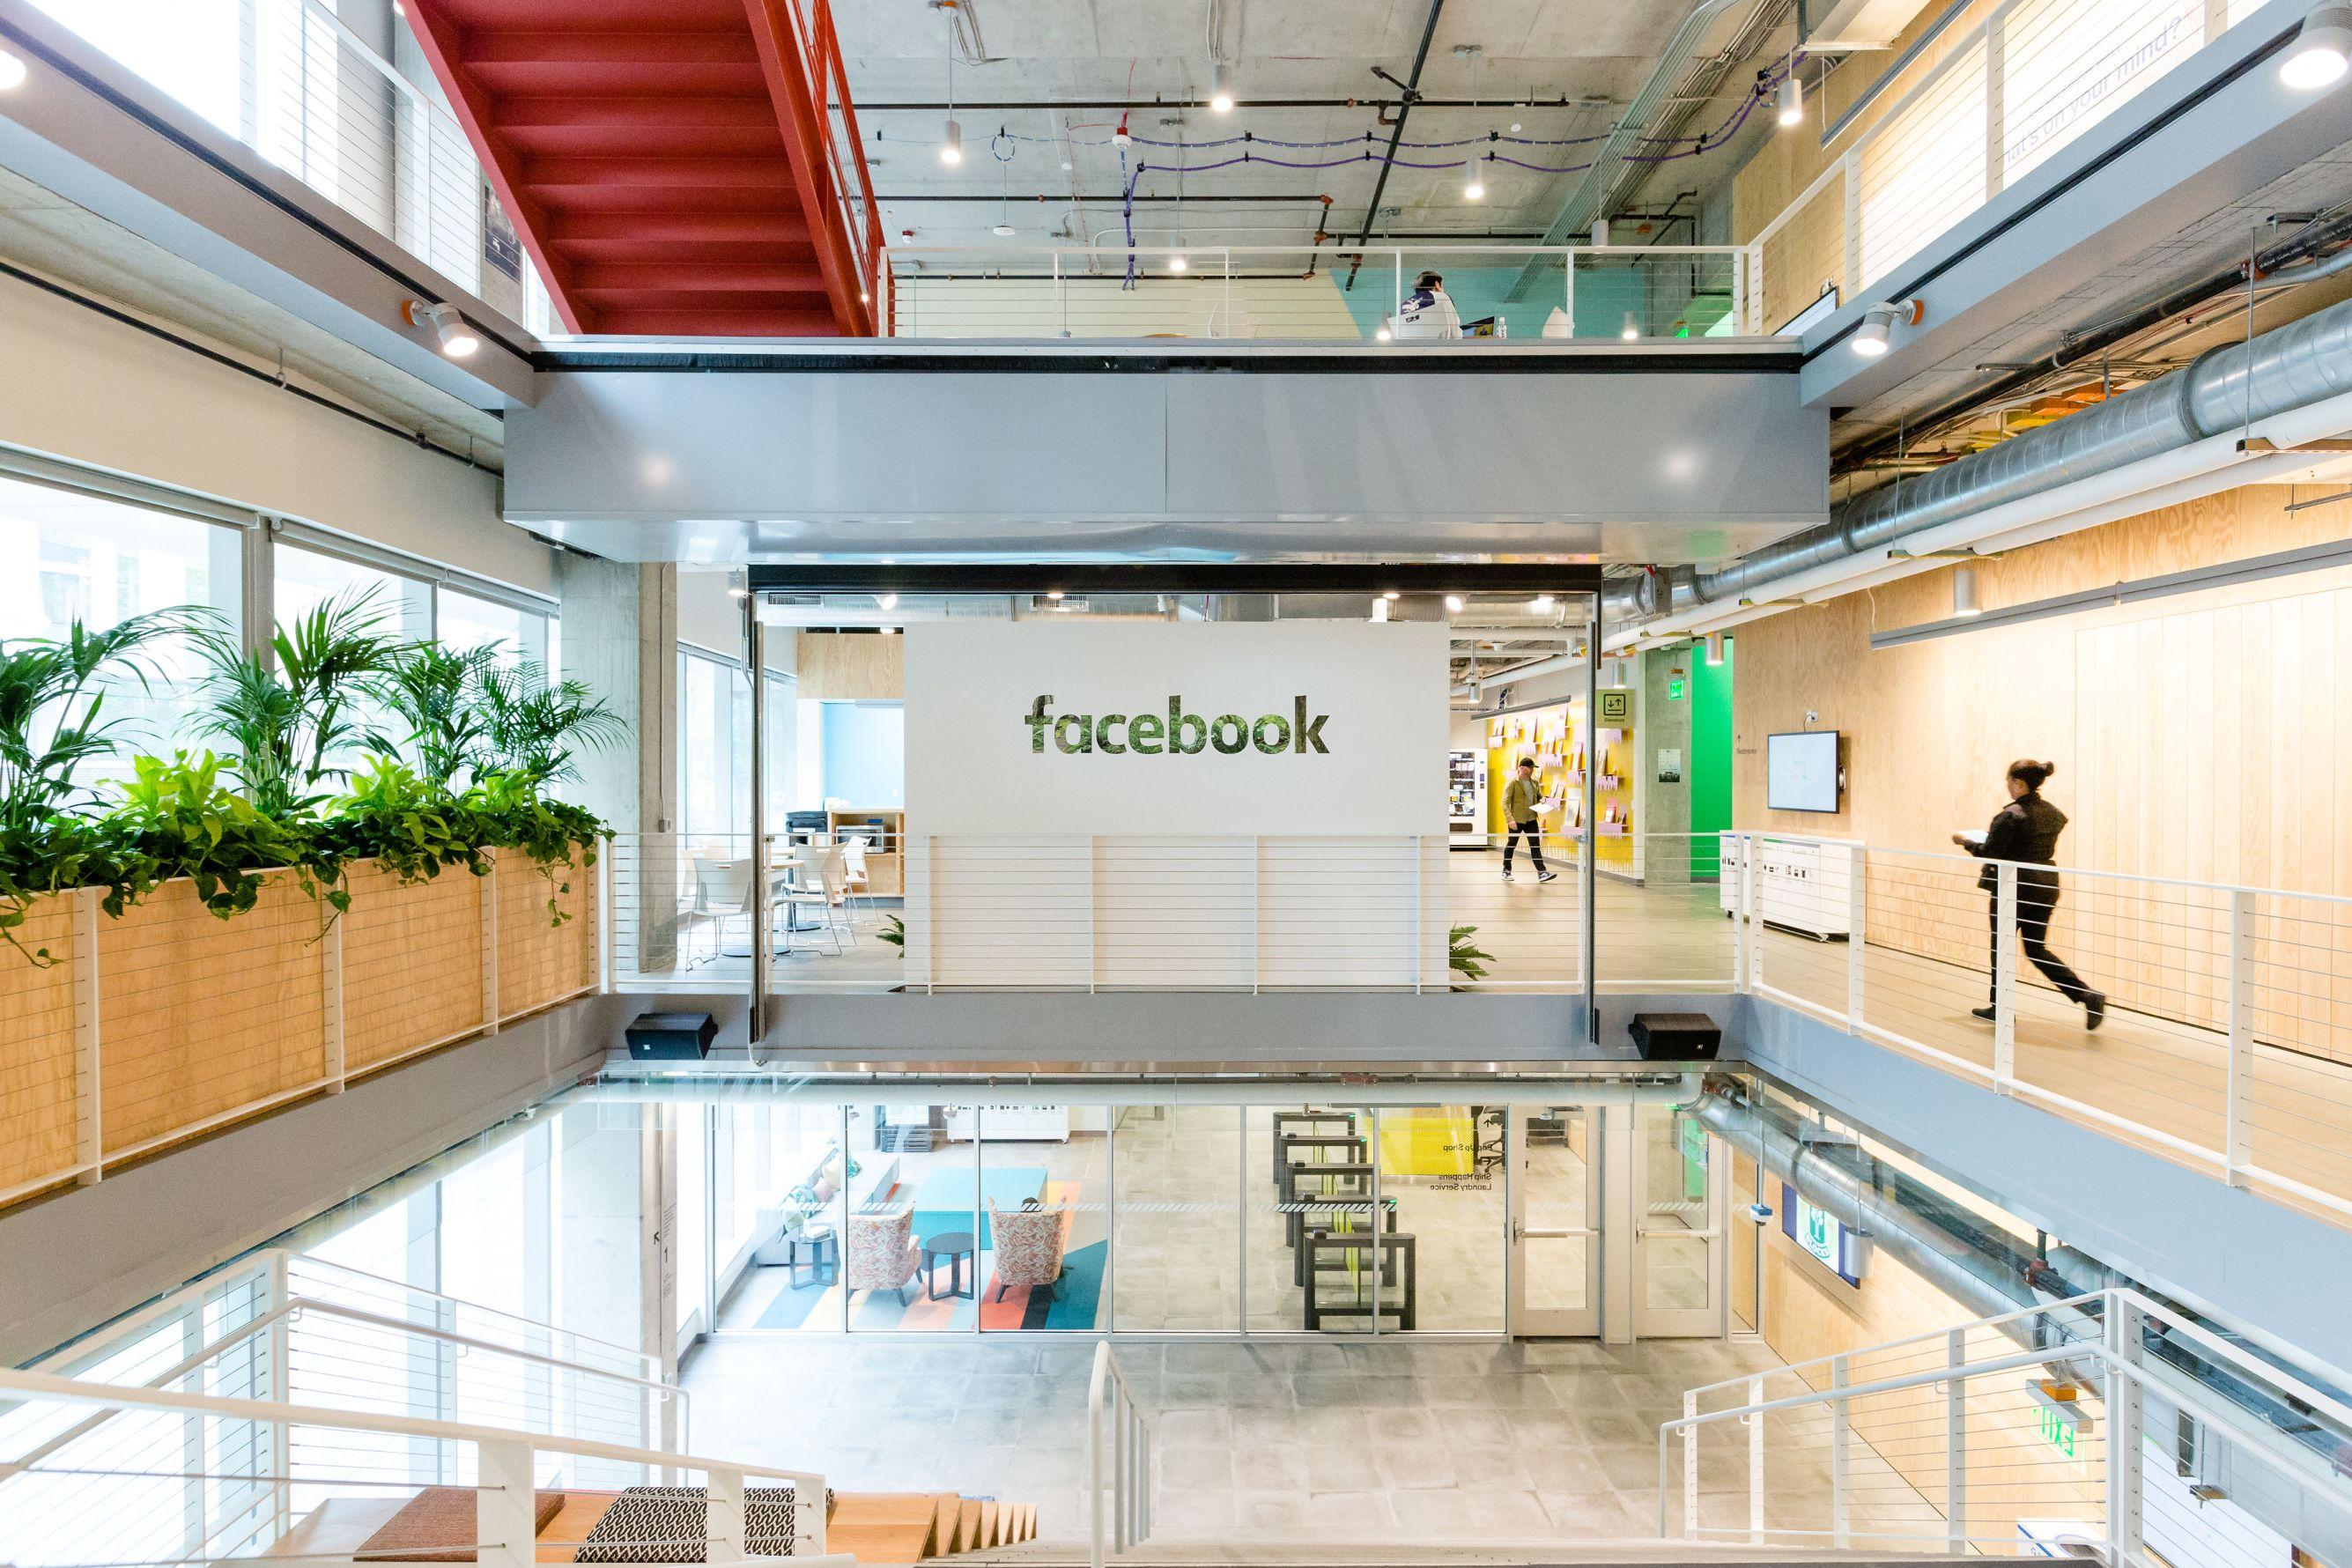 The atrium at Facebook's Seattle office.